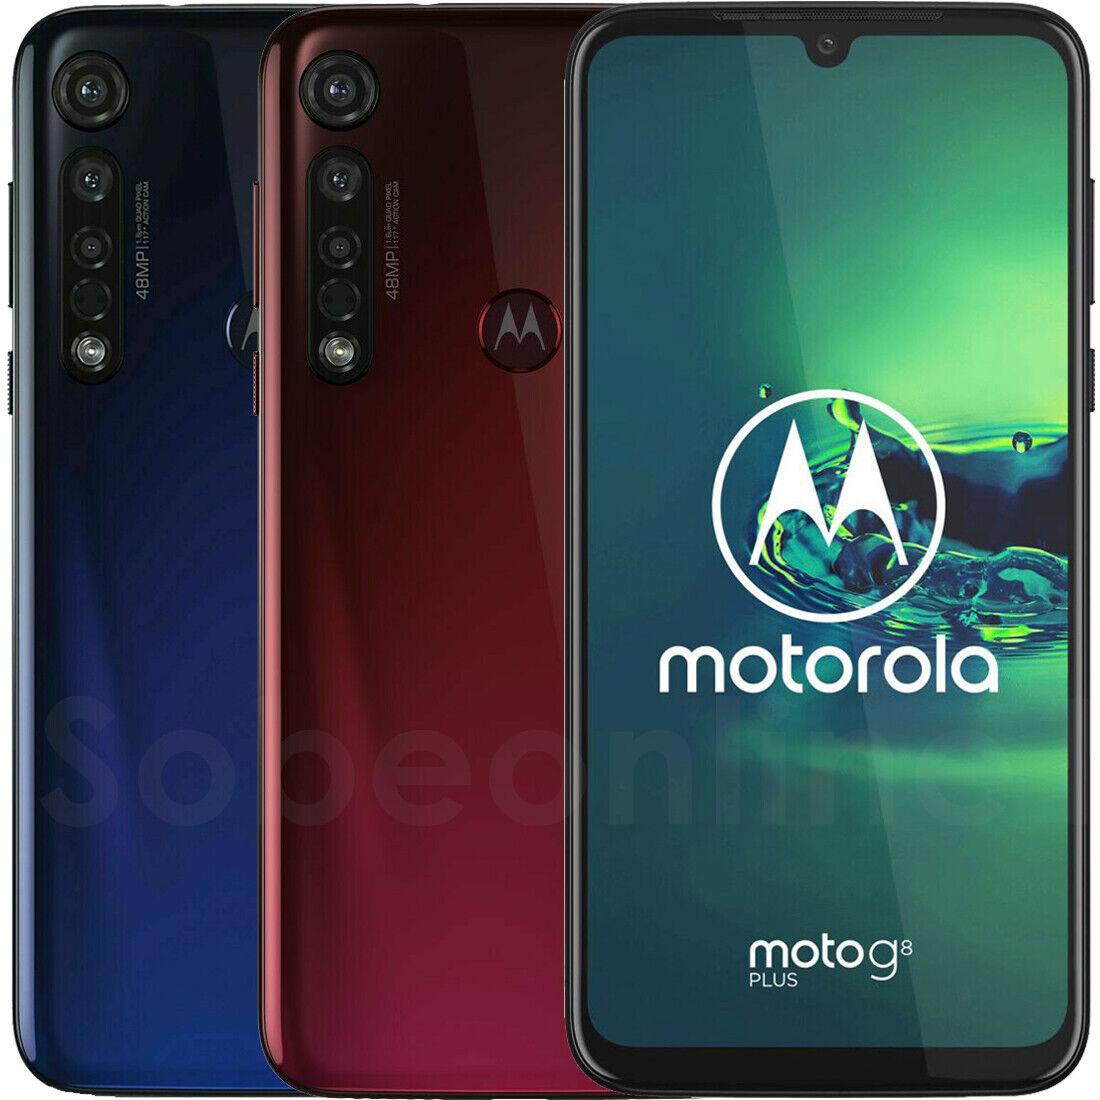 Motorola Moto G8 Plus 64GB 4GB RAM XT2019-2 Dual Sim (FACTORY UNLOCKED) 6.3